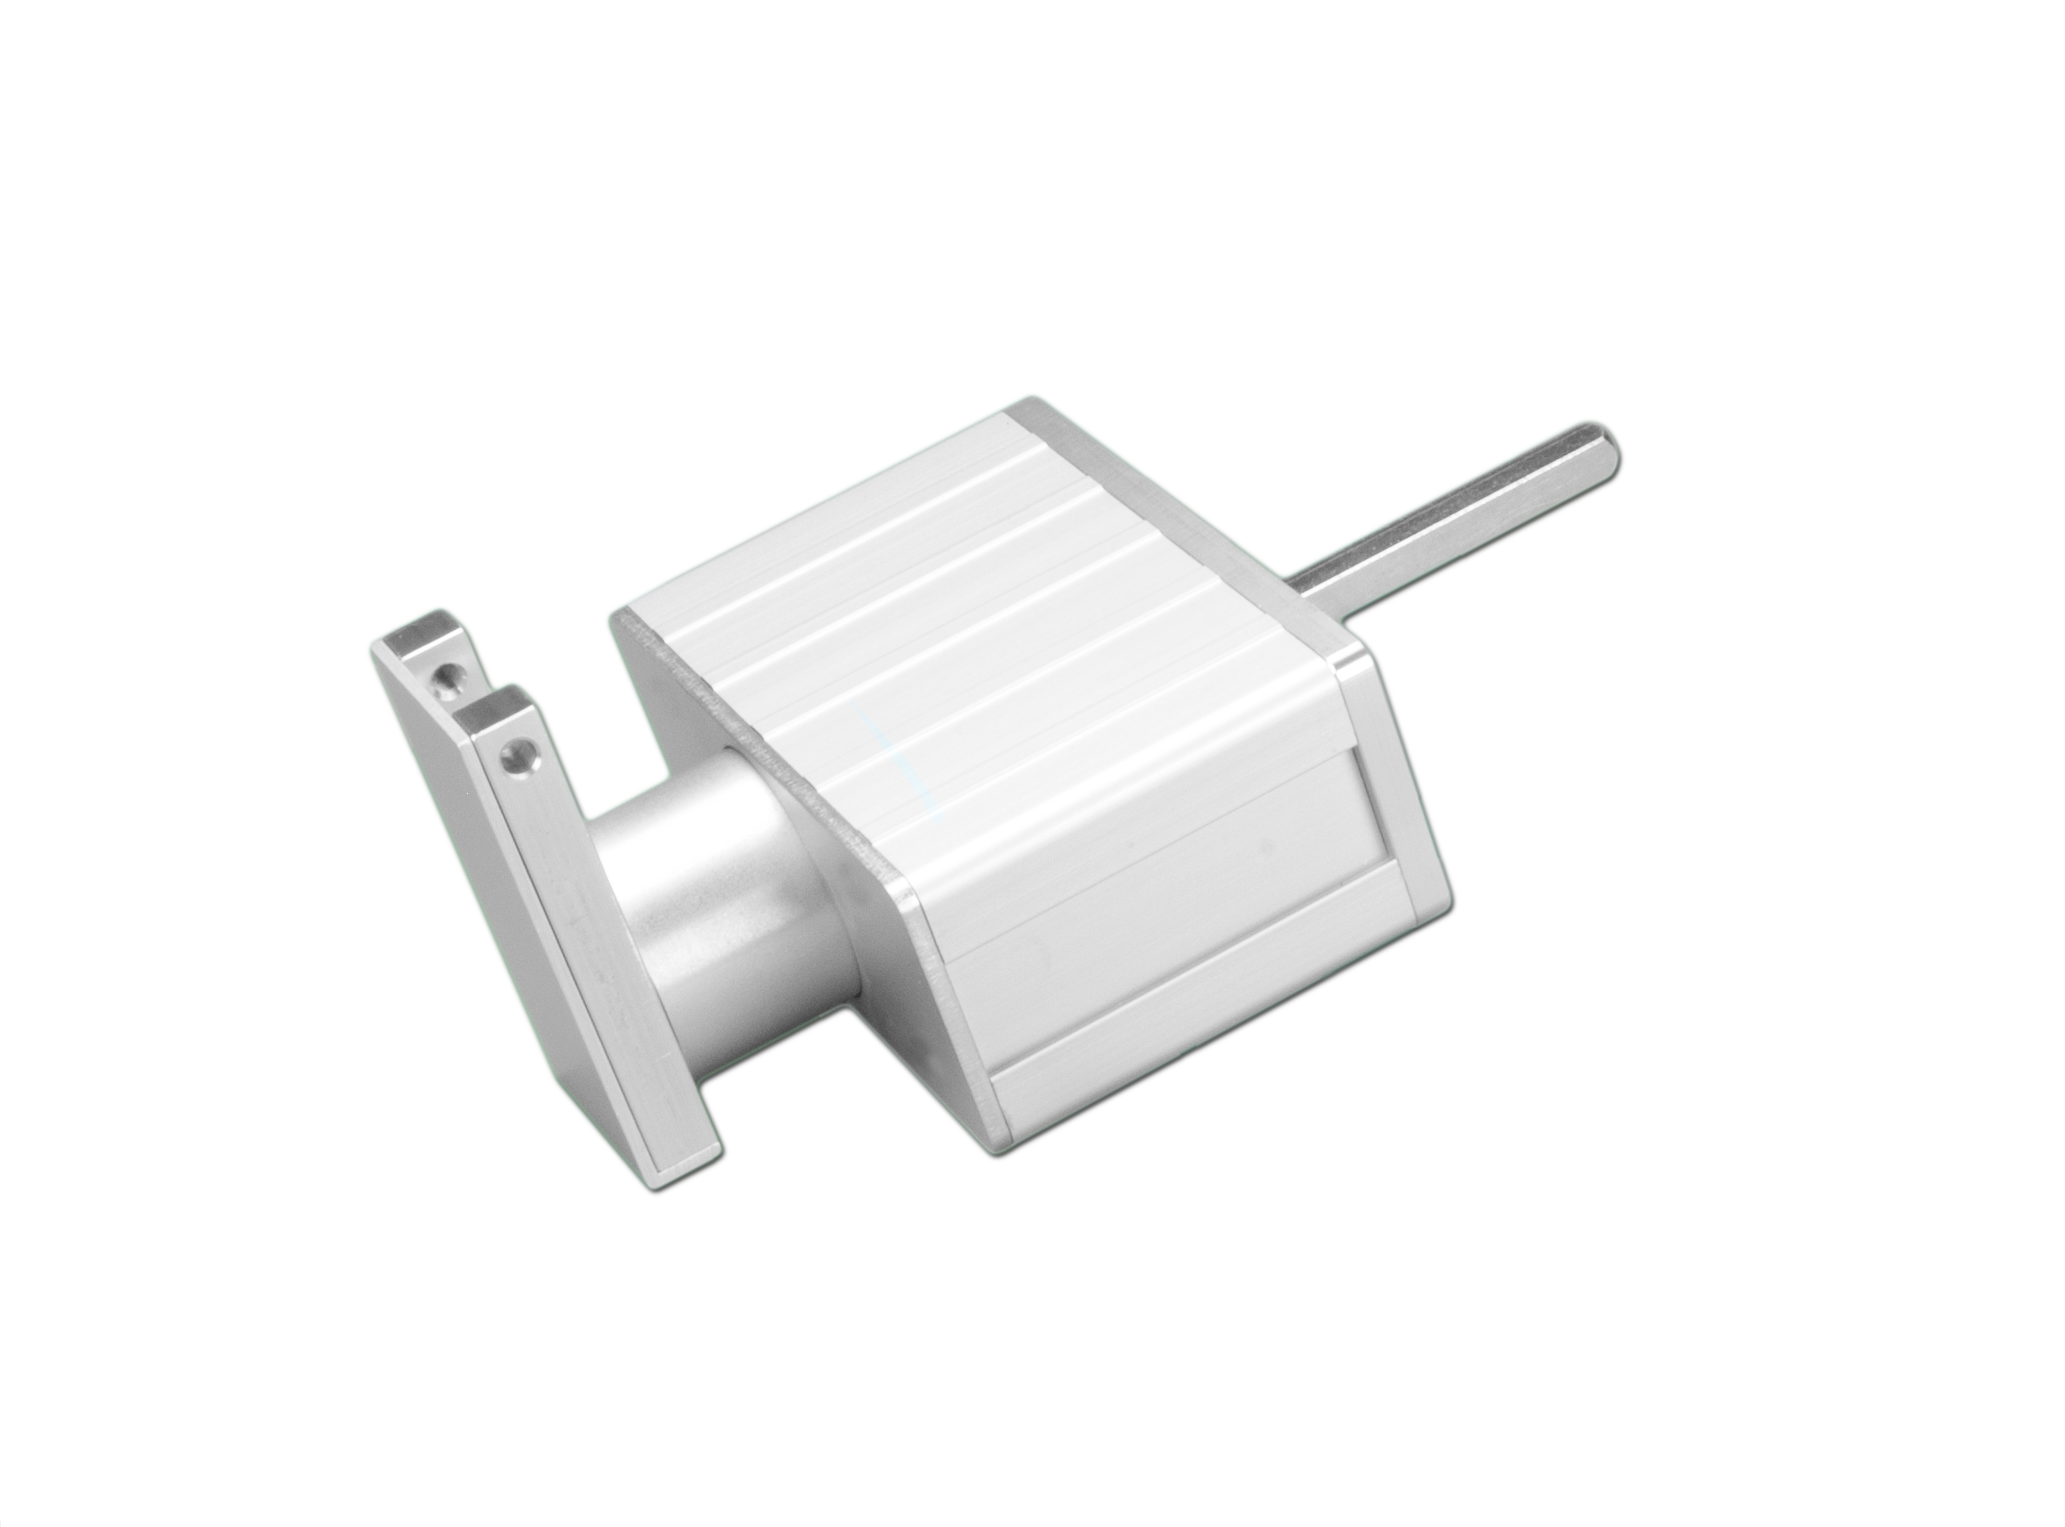 HELIMATIC² - Innovative Locking